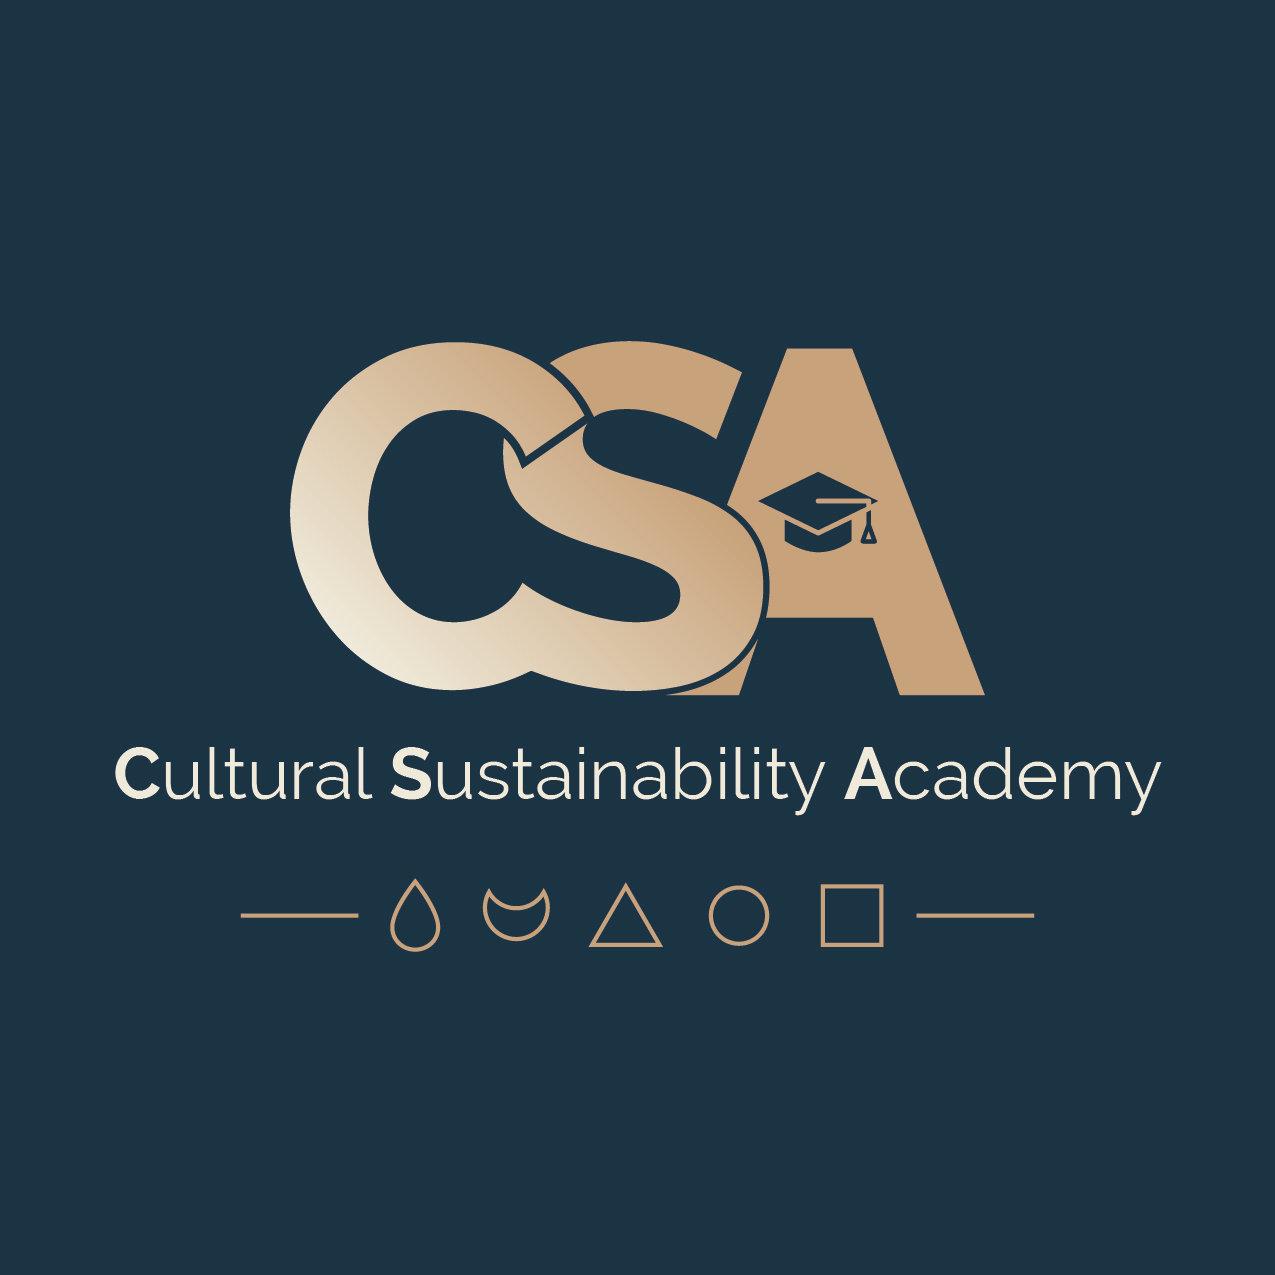 Cultural Sustainability Academy